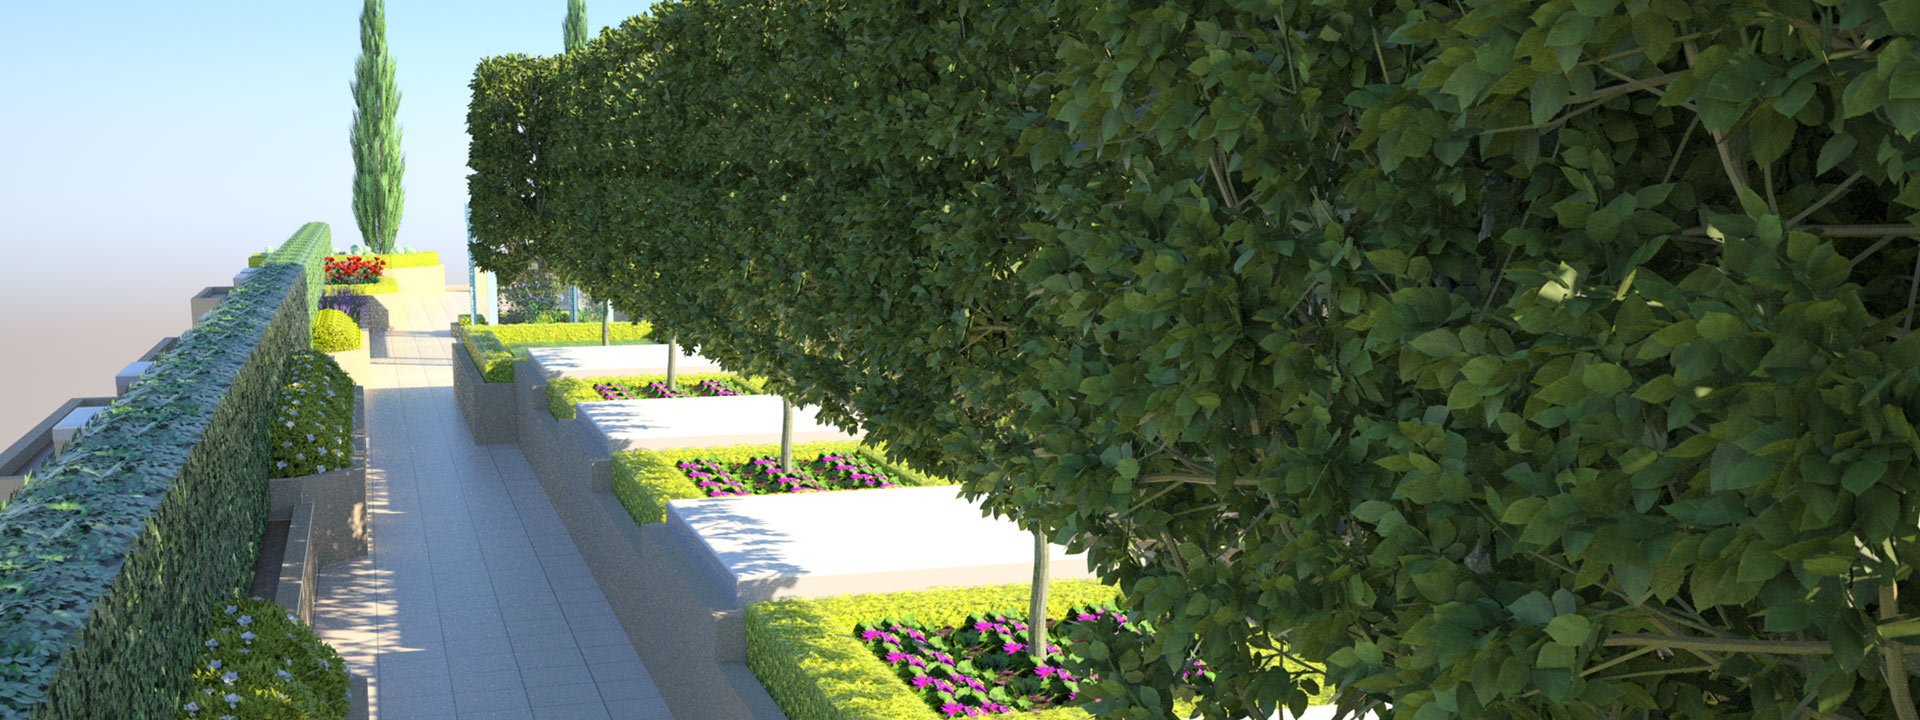 prunned hedge walls